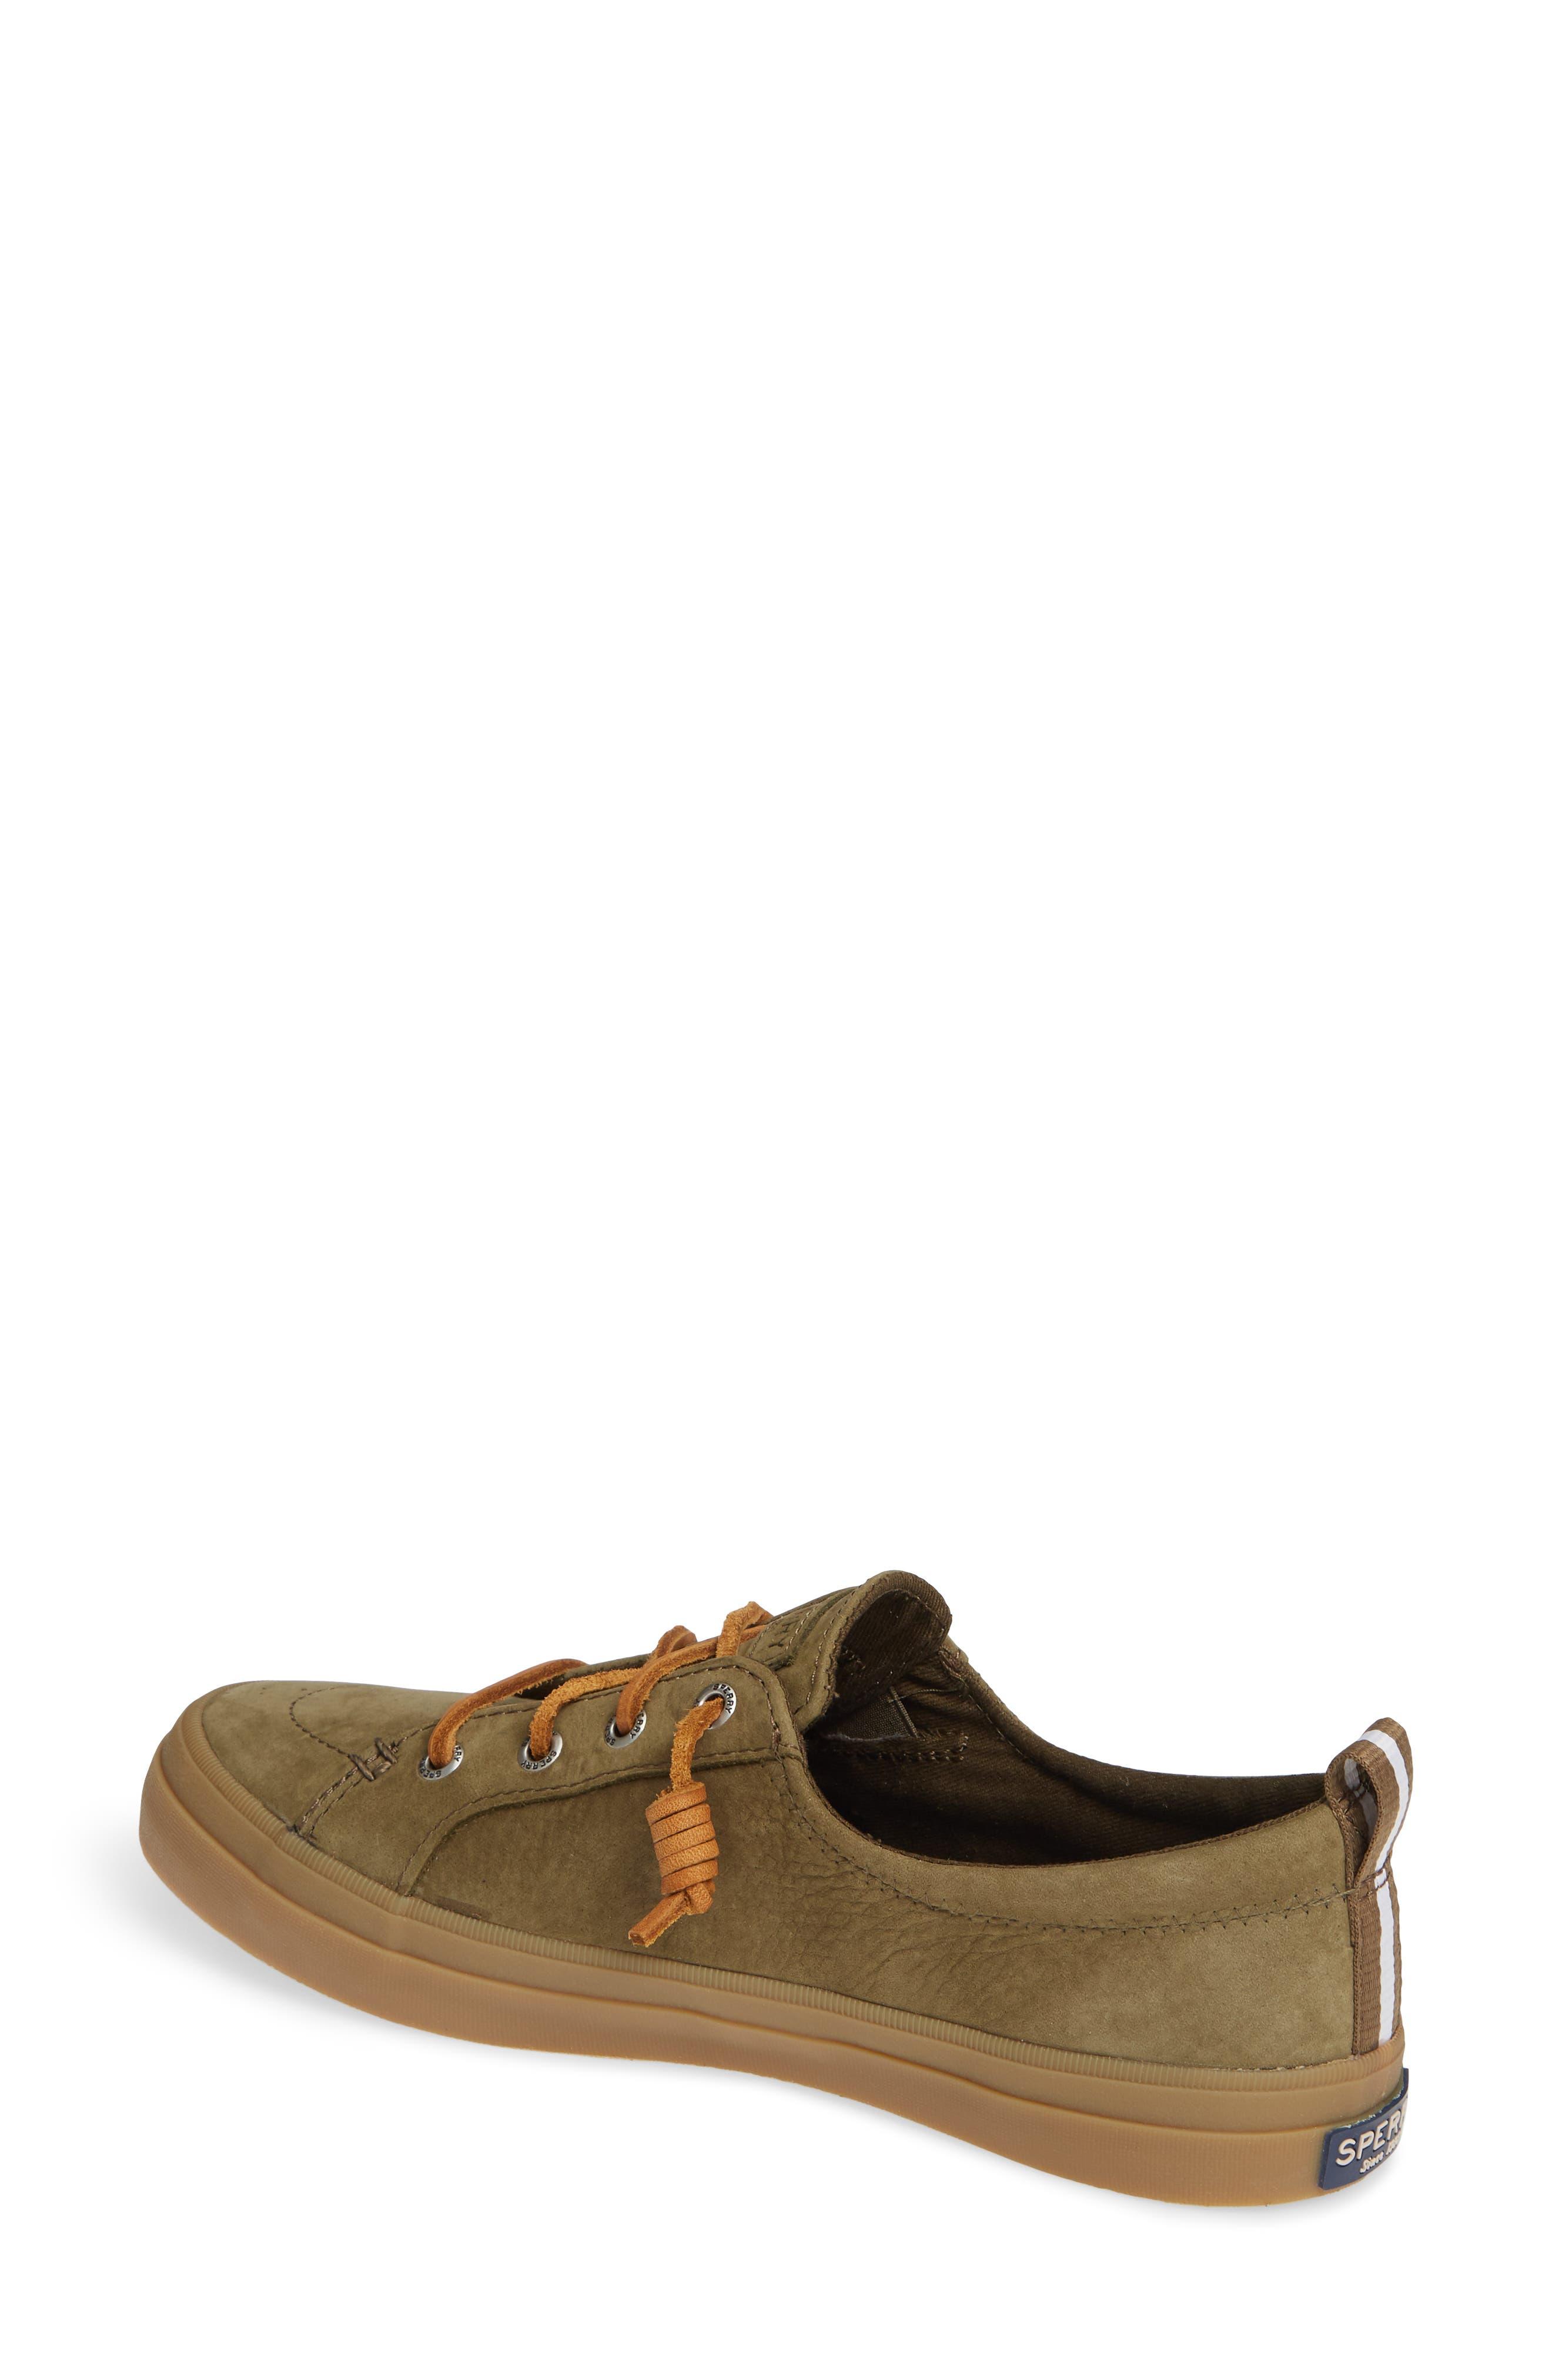 Crest Vibe Sneaker,                             Alternate thumbnail 2, color,                             OLIVE LEATHER